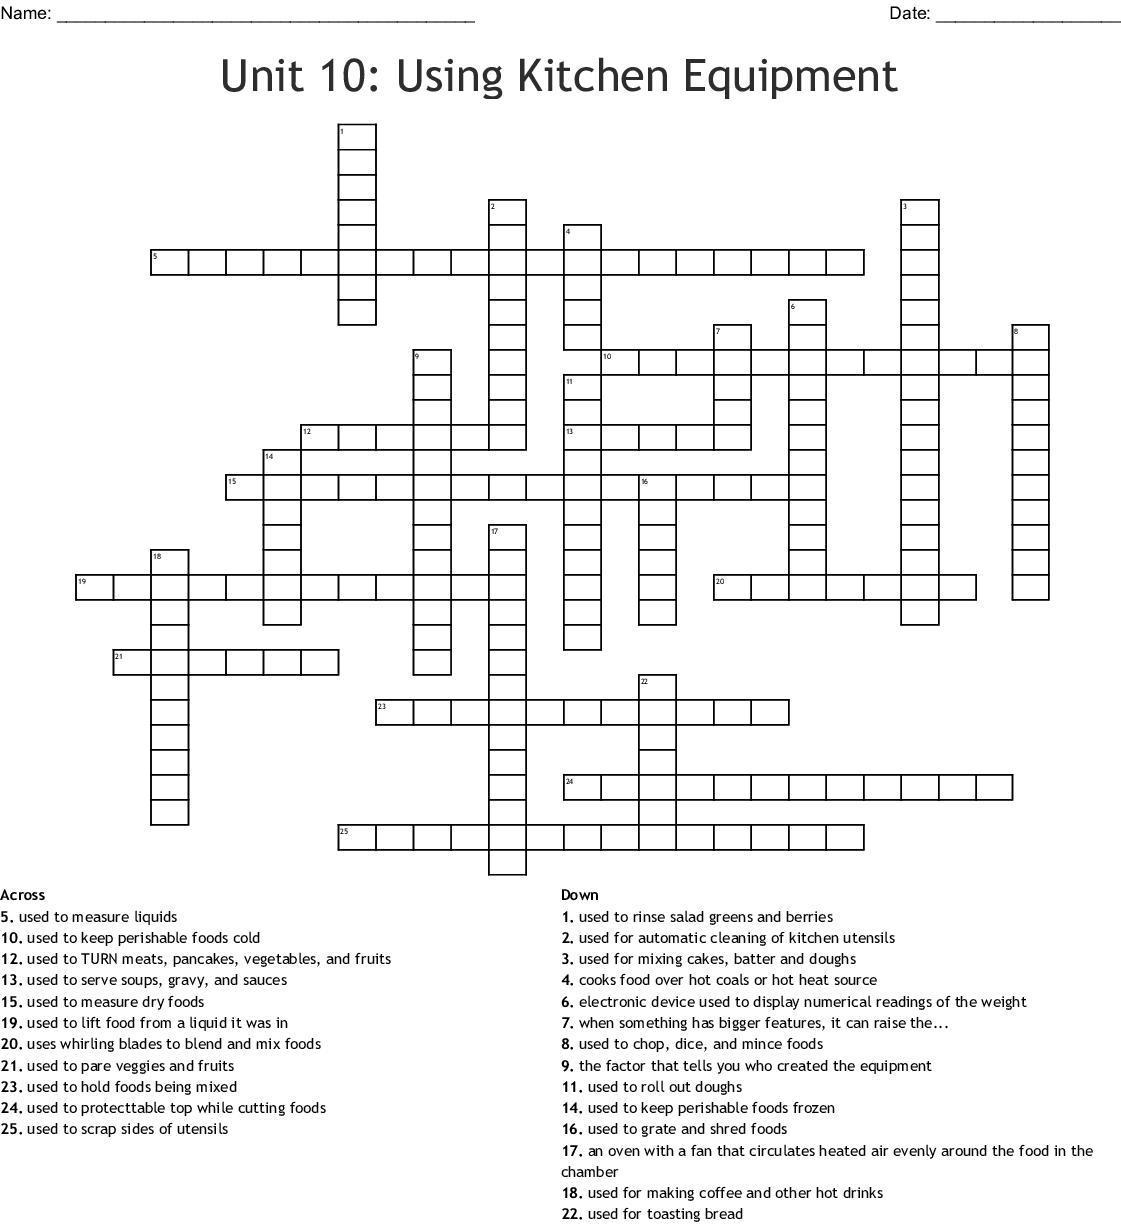 Unit 10 Using Kitchen Equipment Crossword